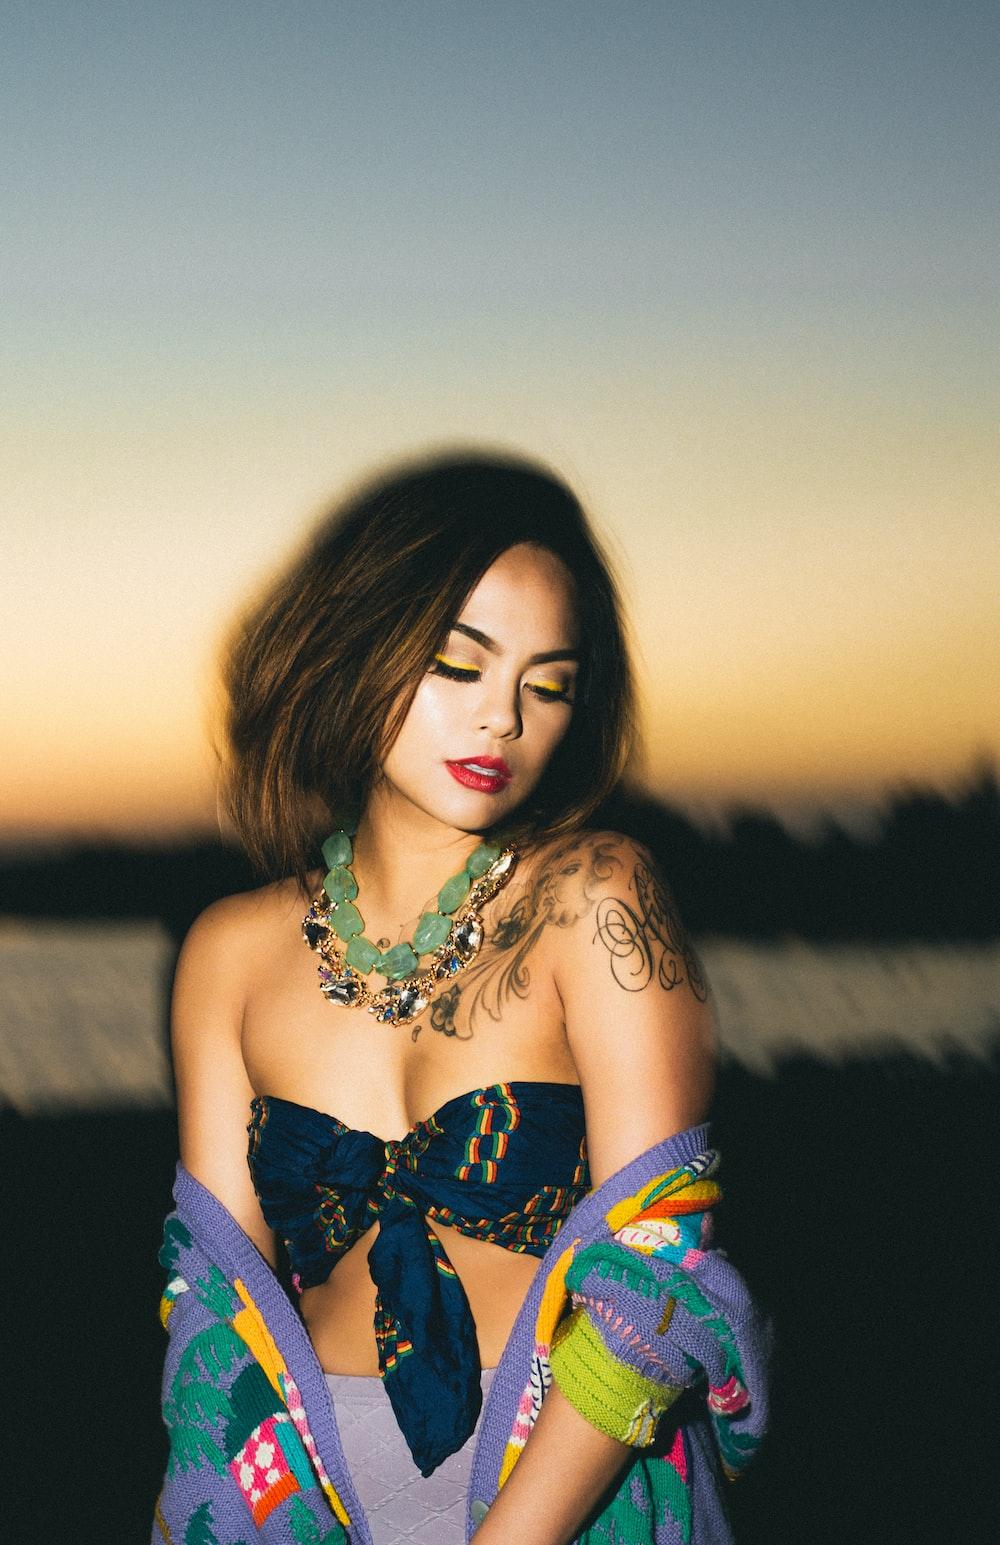 woman in blue strapless bra